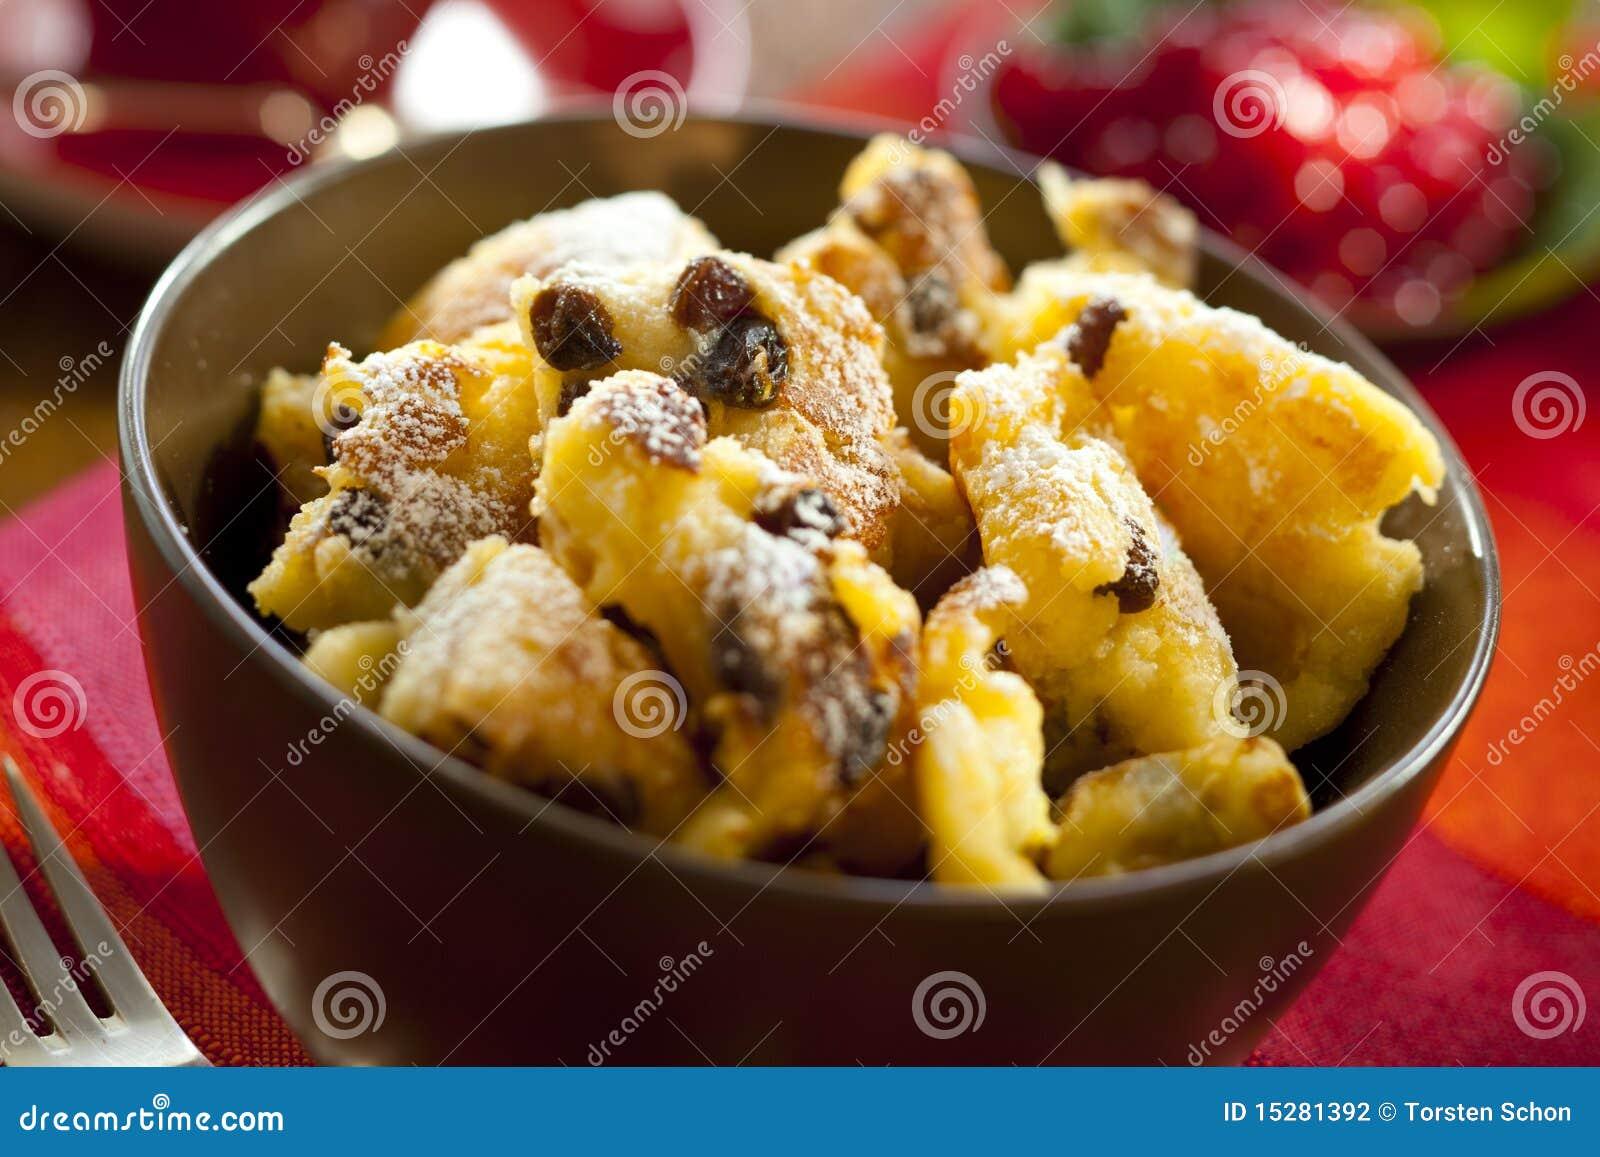 Cut-up and sugared pancake